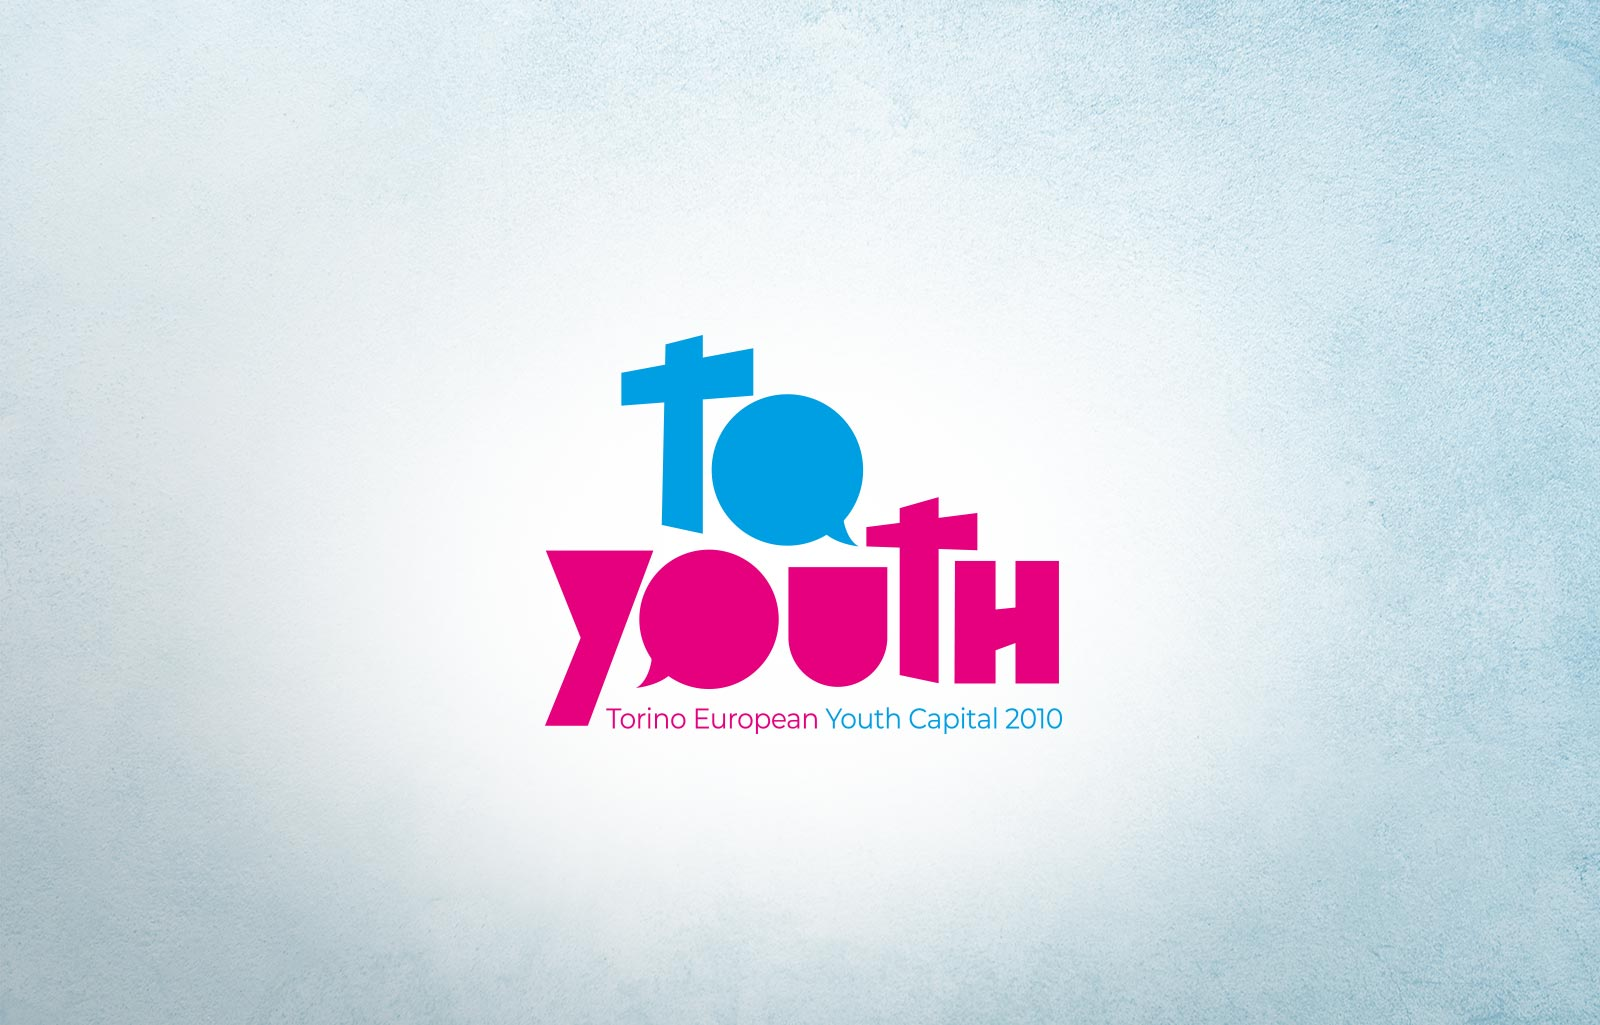 logo to youth torino european capital comune turismo Diego Favaretto Web designer